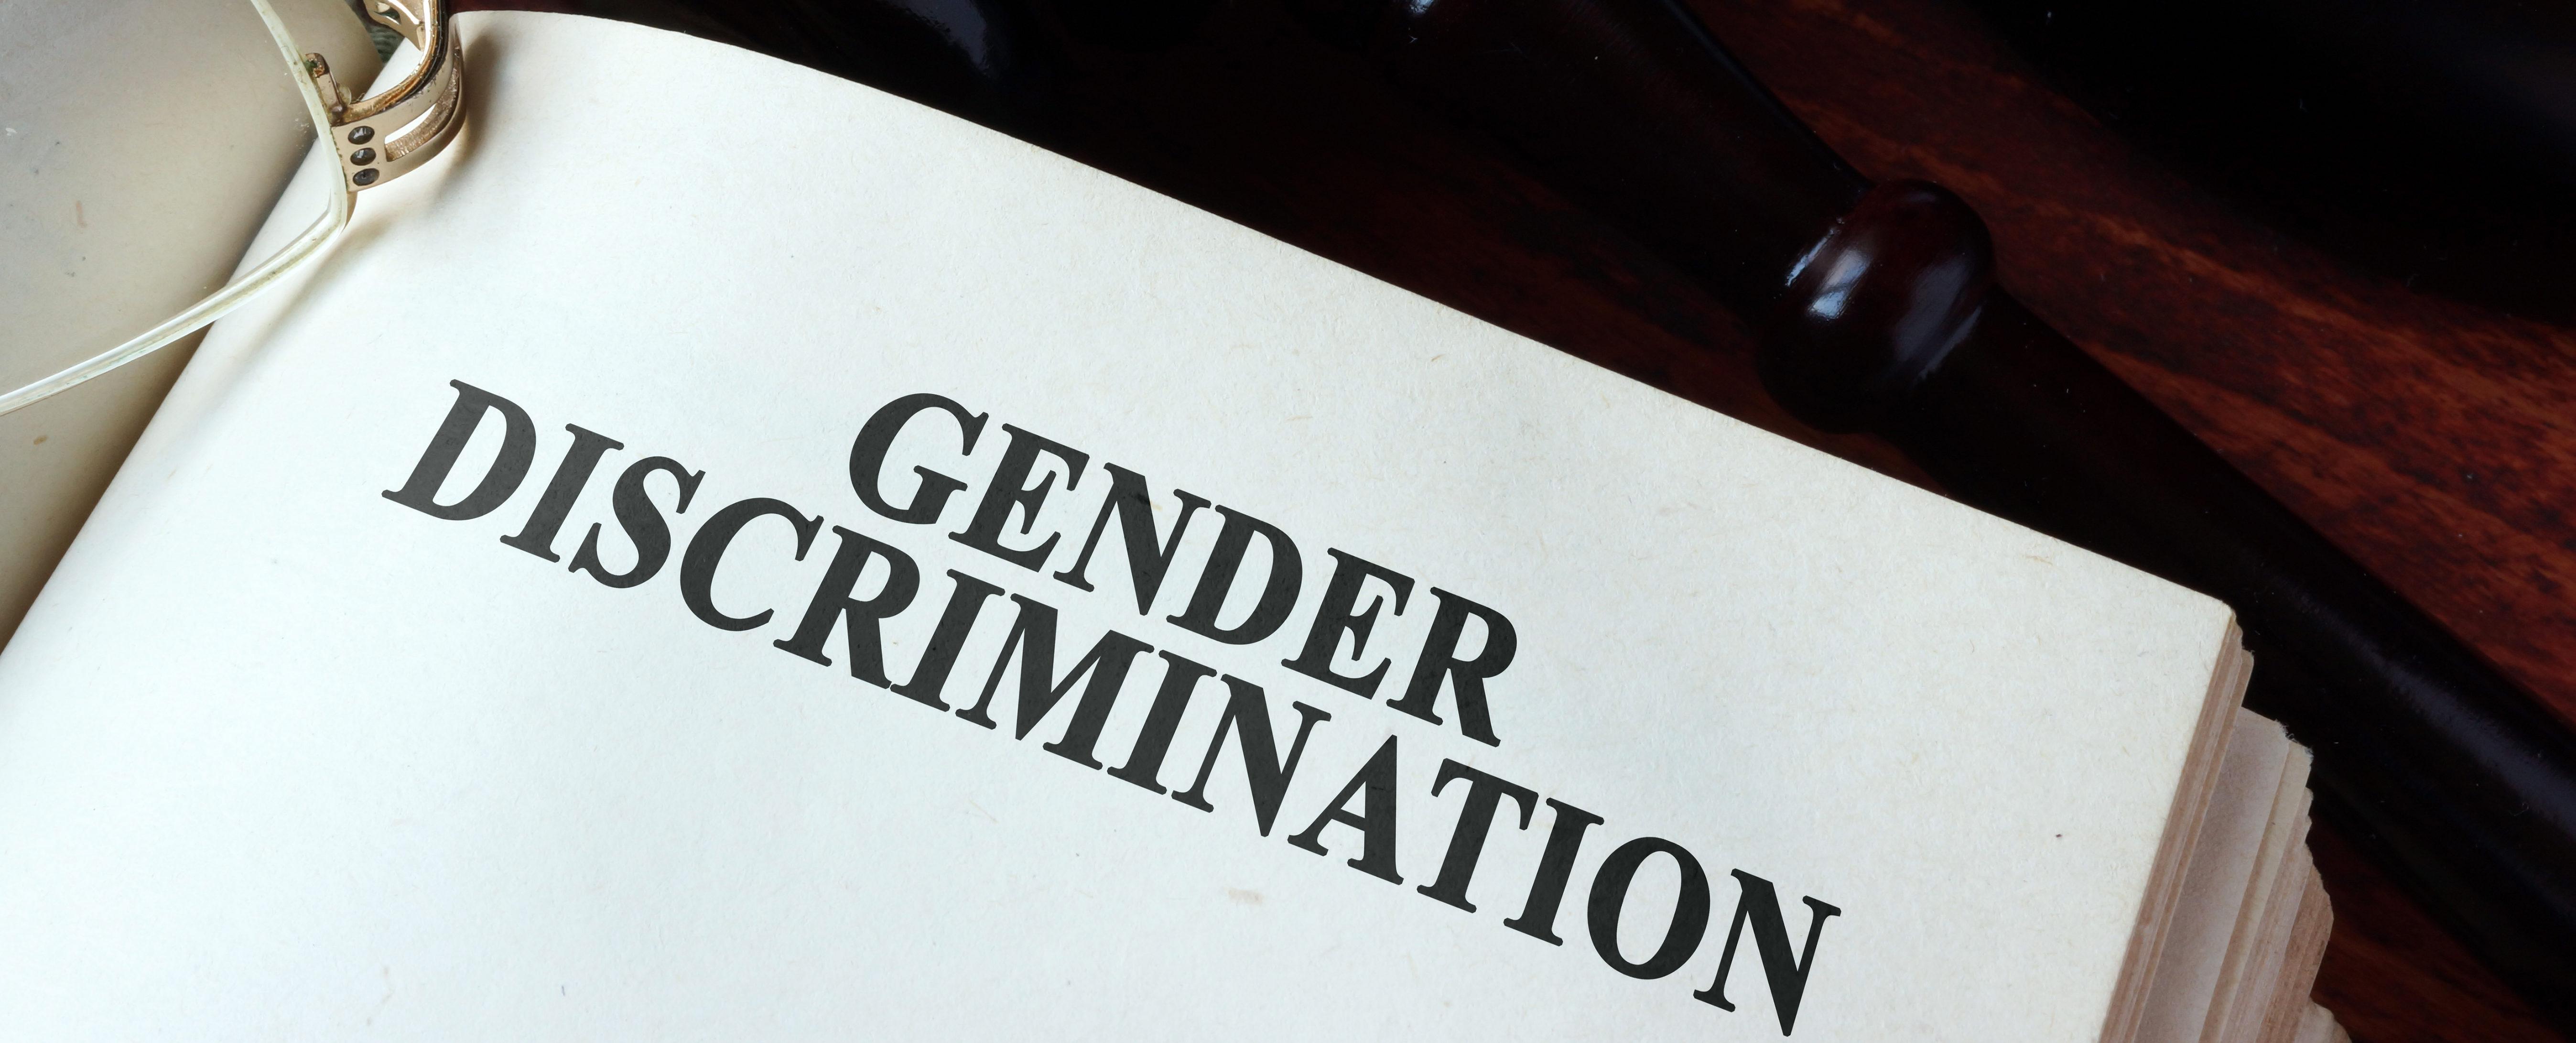 Gender discrimation with gavel (Shutterstock/designer491)